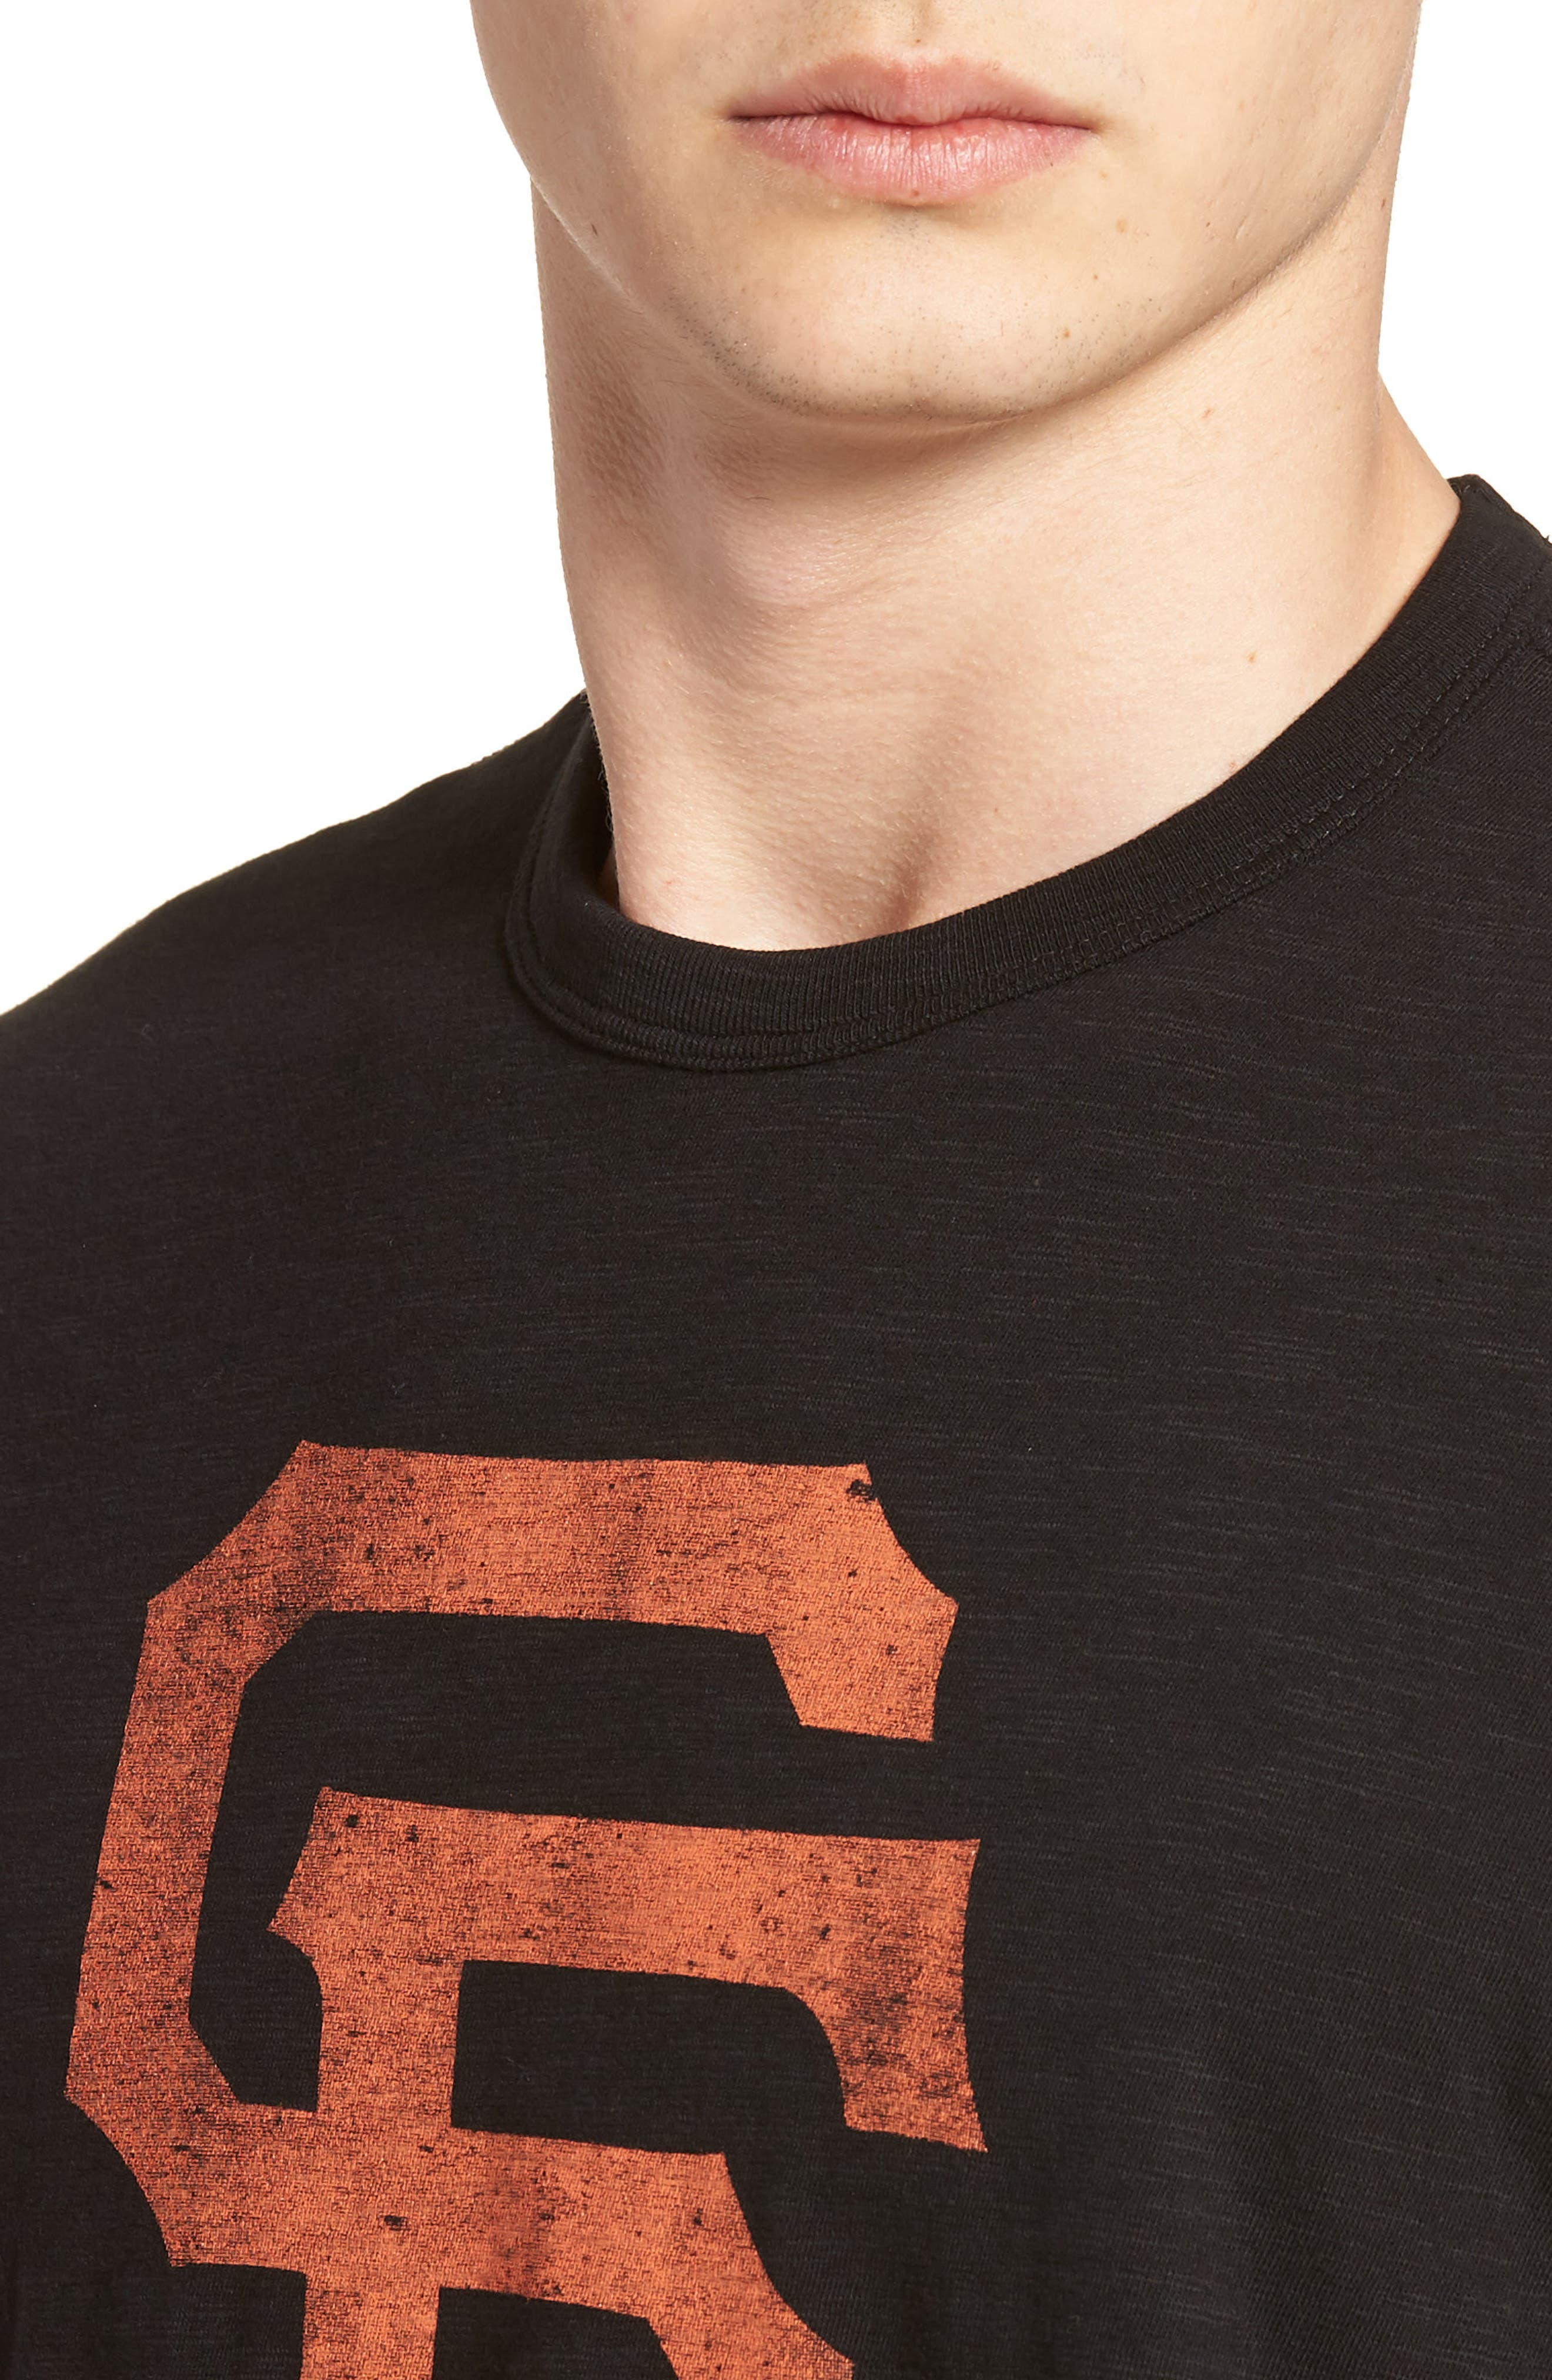 Grit Scrum San Francisco Giants T-Shirt,                             Alternate thumbnail 4, color,                             Jet Black